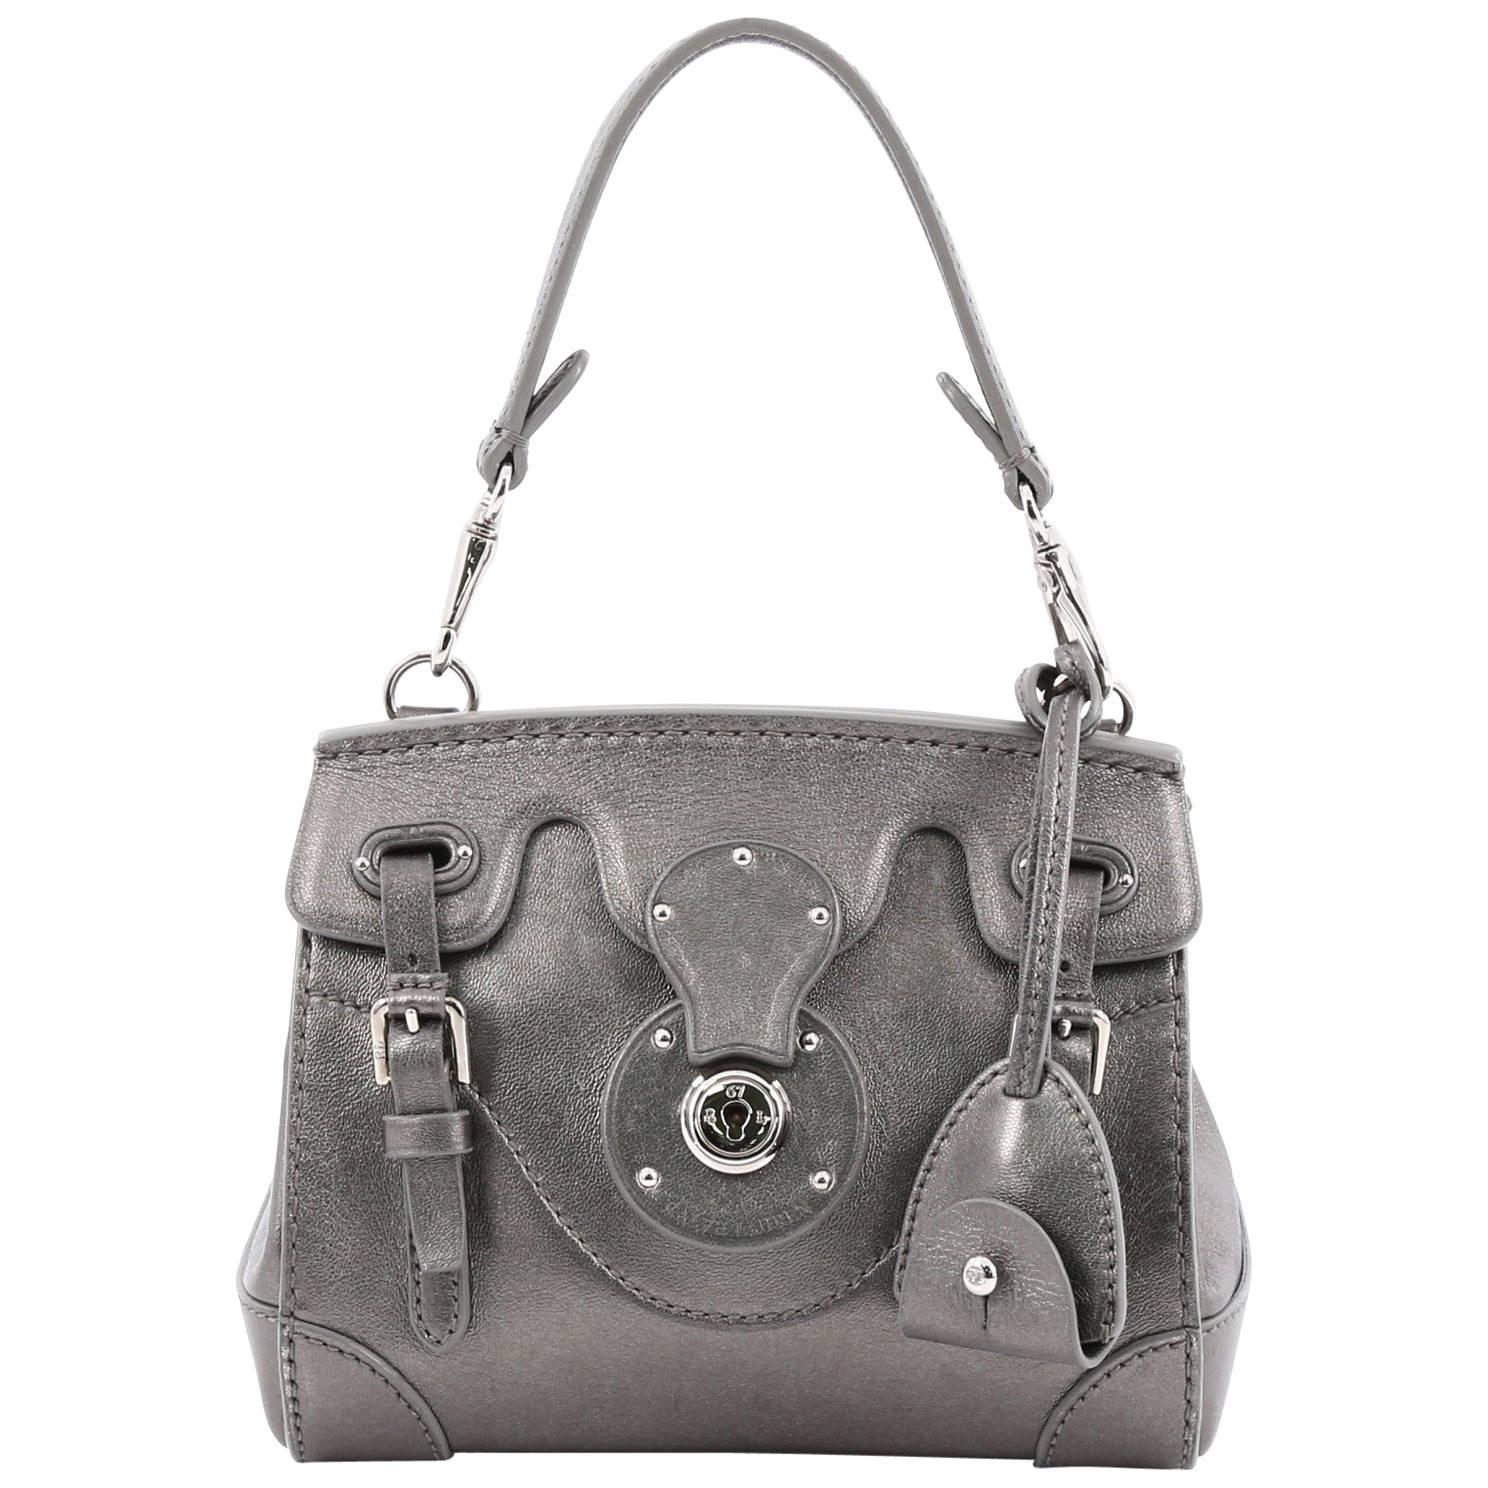 Ralph Lauren Collection Ricky Crossbody Bag Leather Mini at 1stdibs c12ed4666d5b3